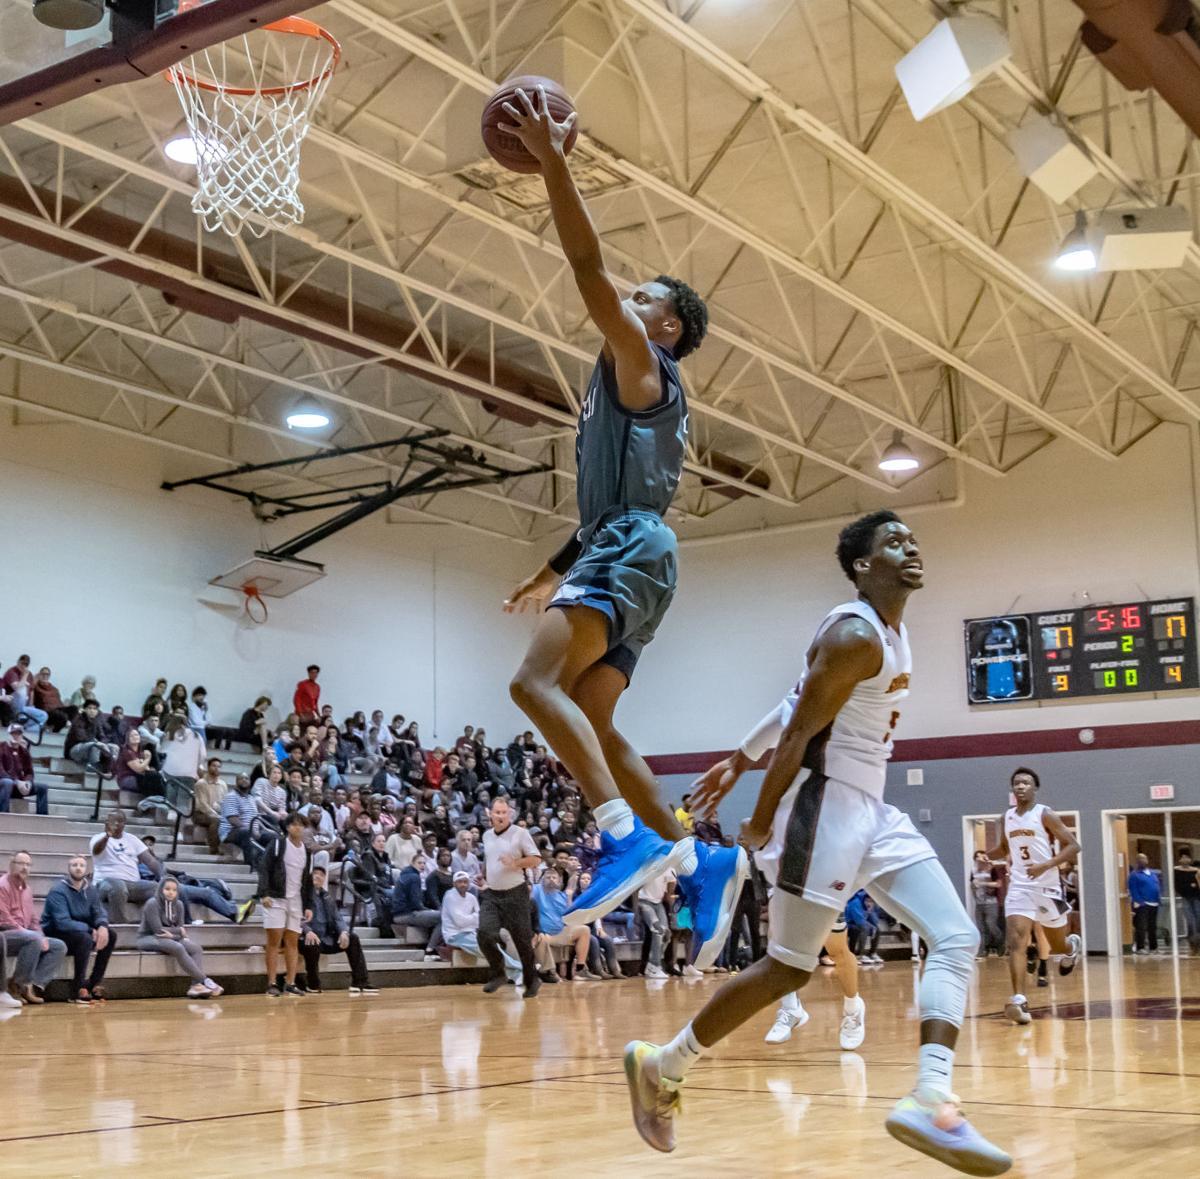 Thursday night high school basketball action